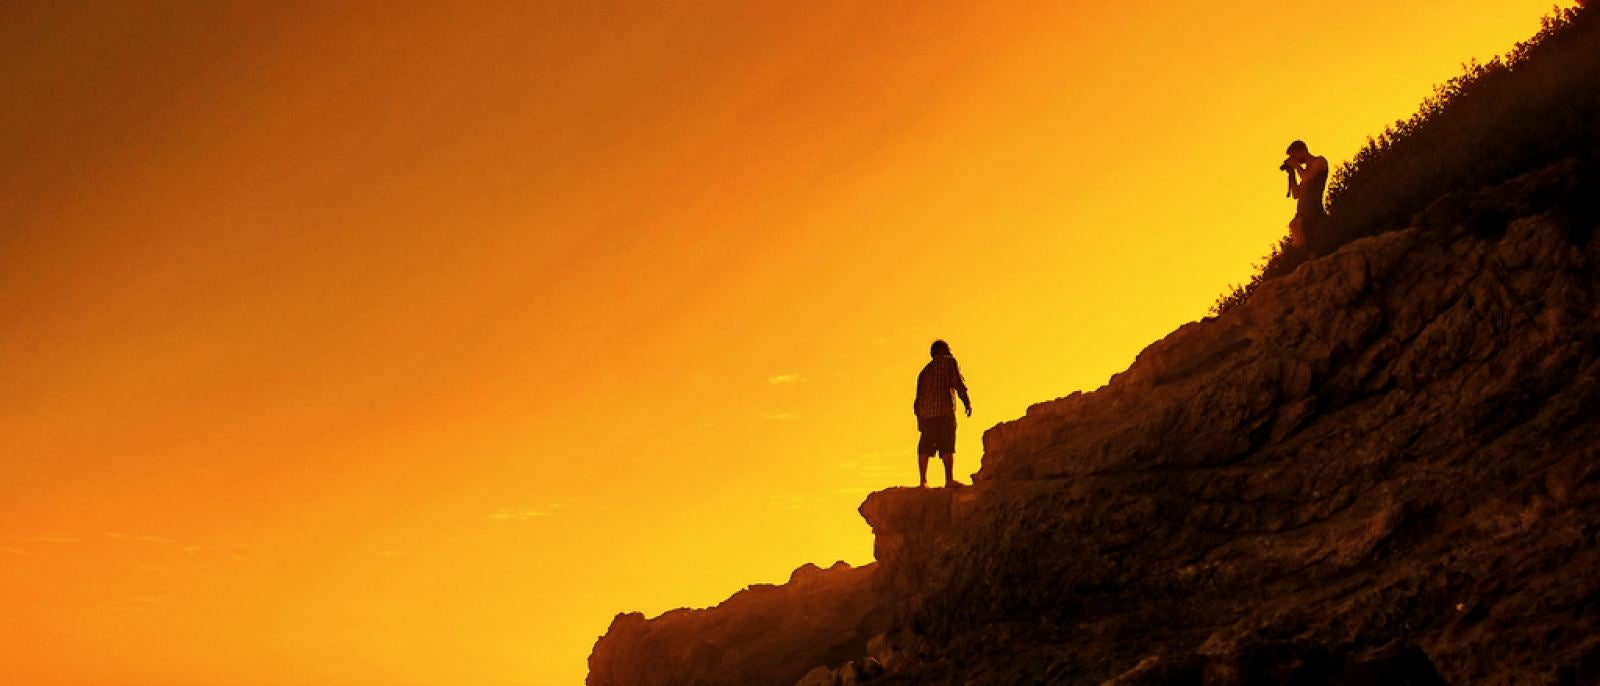 Capturing the sunset at Leo Carrillo State Beach   Photo: Joseph Voves, Flickr